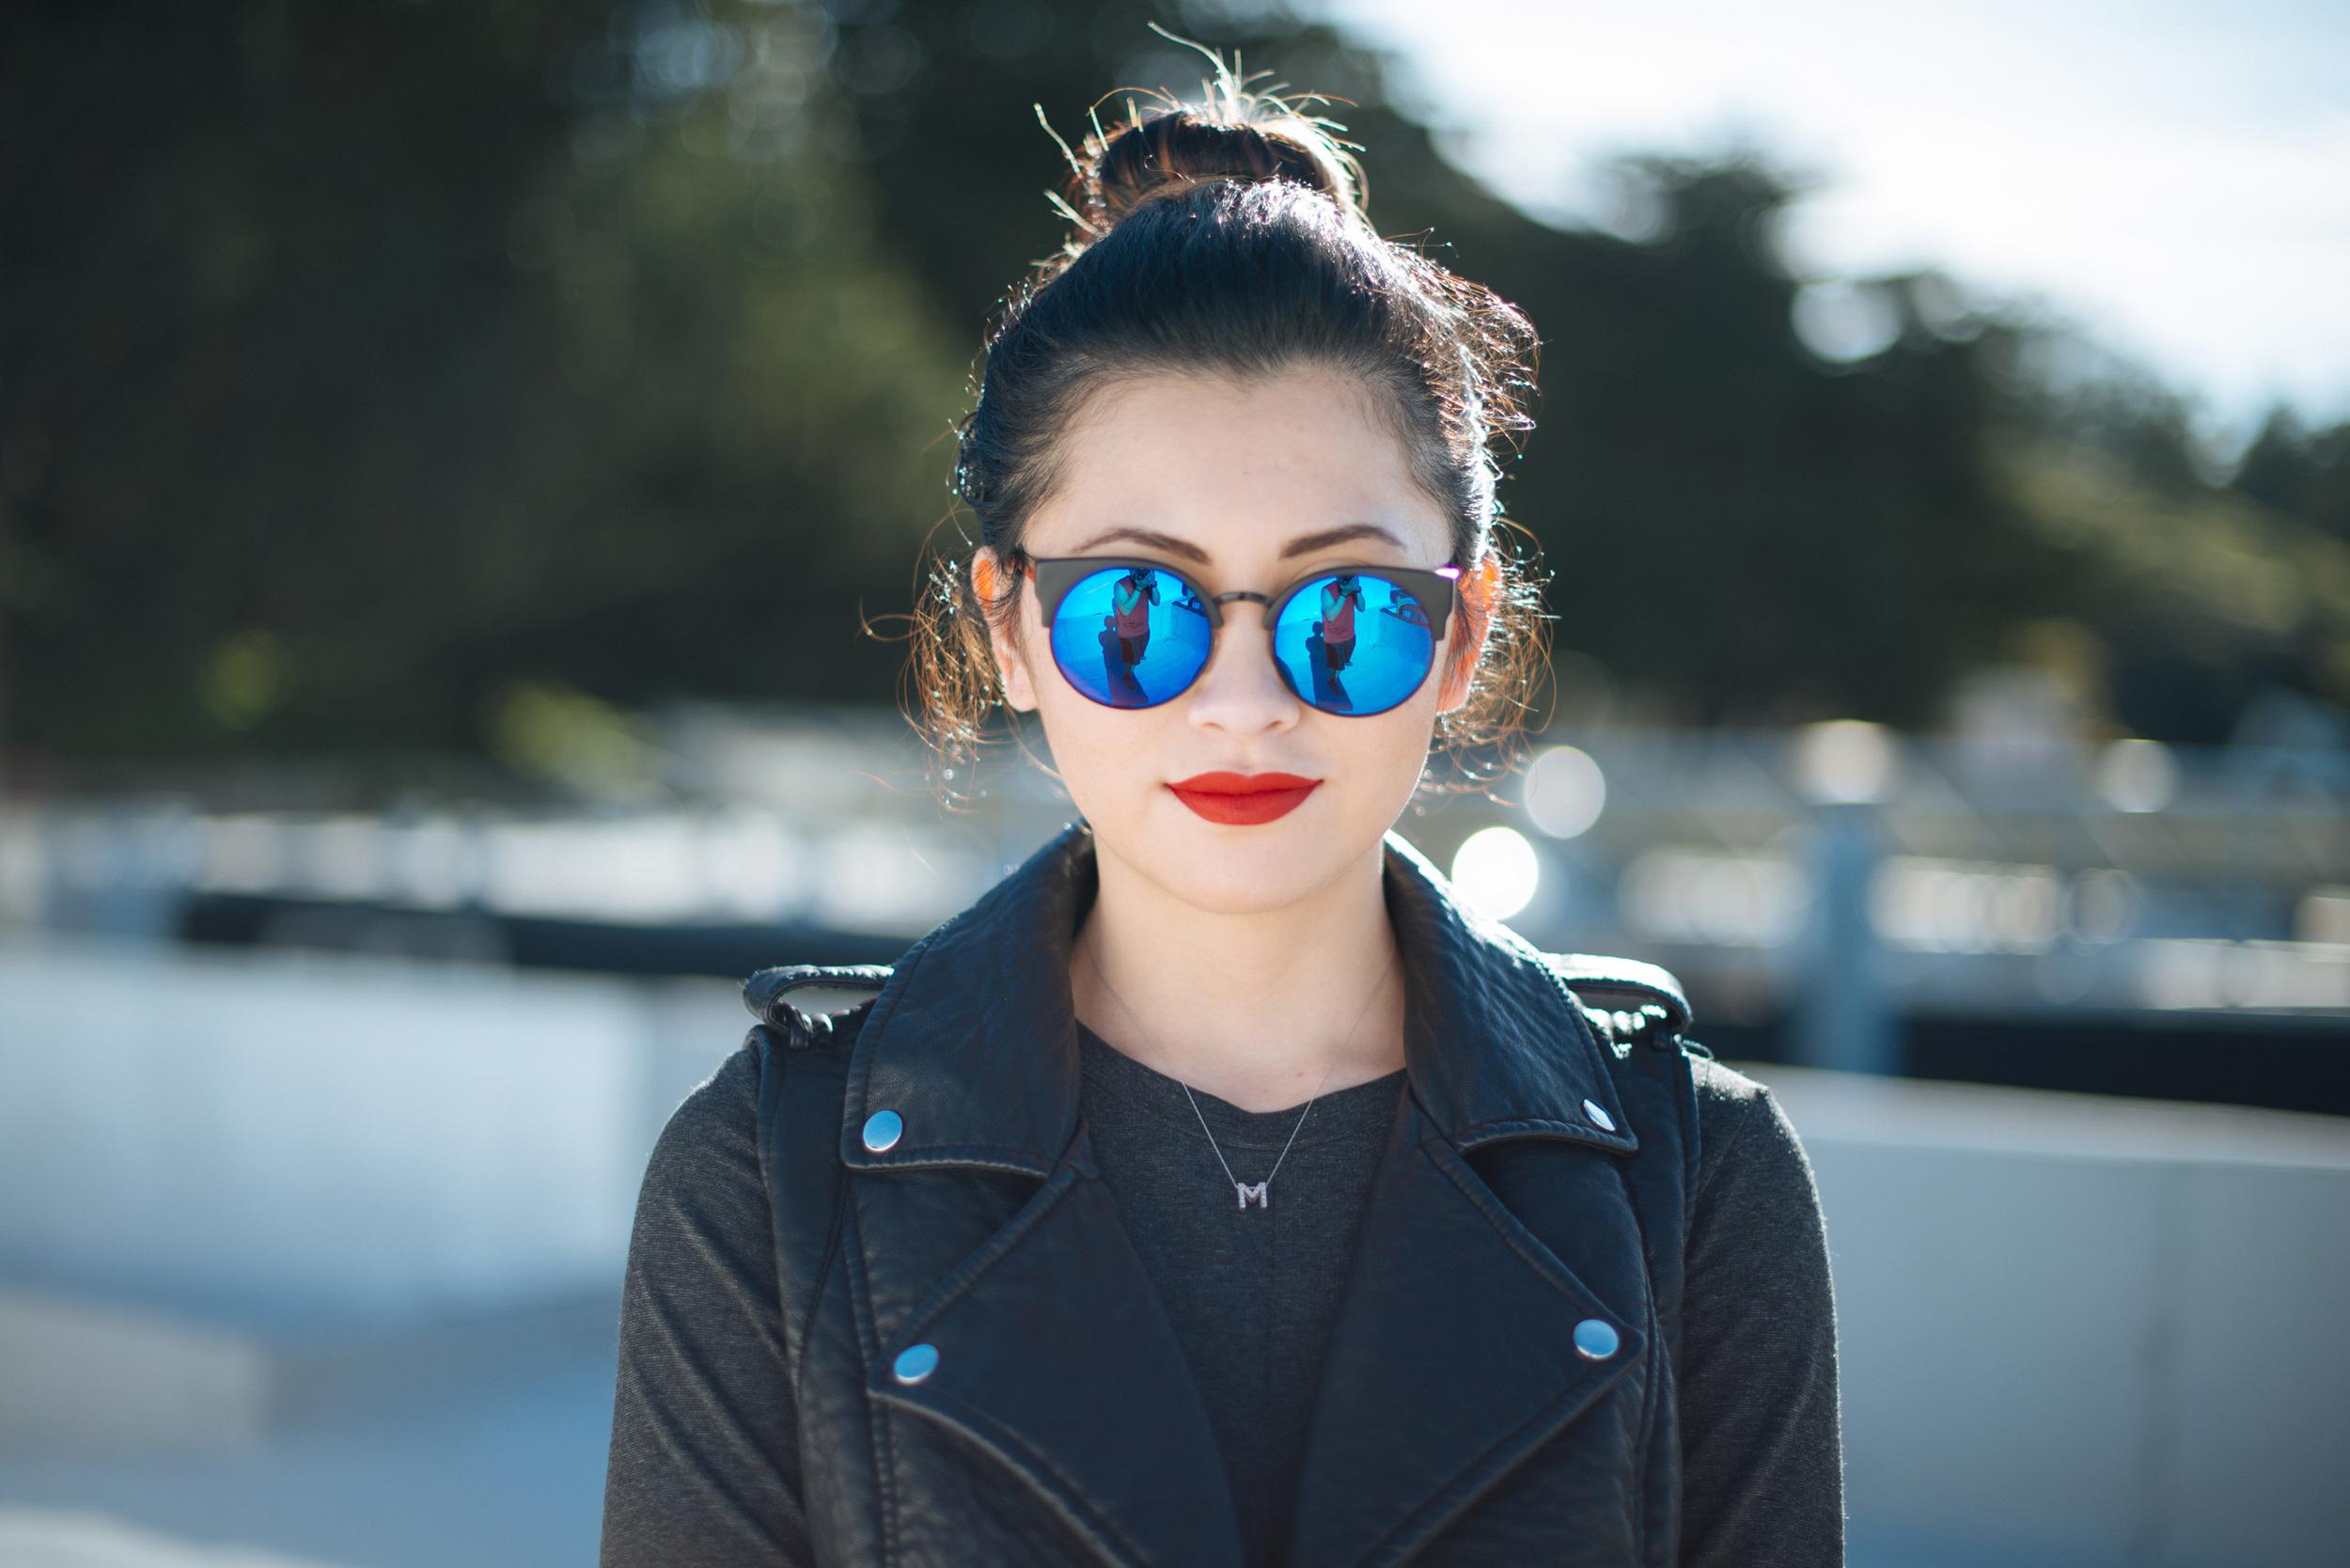 Click to shop similar sunglasses from Ray-Ban.